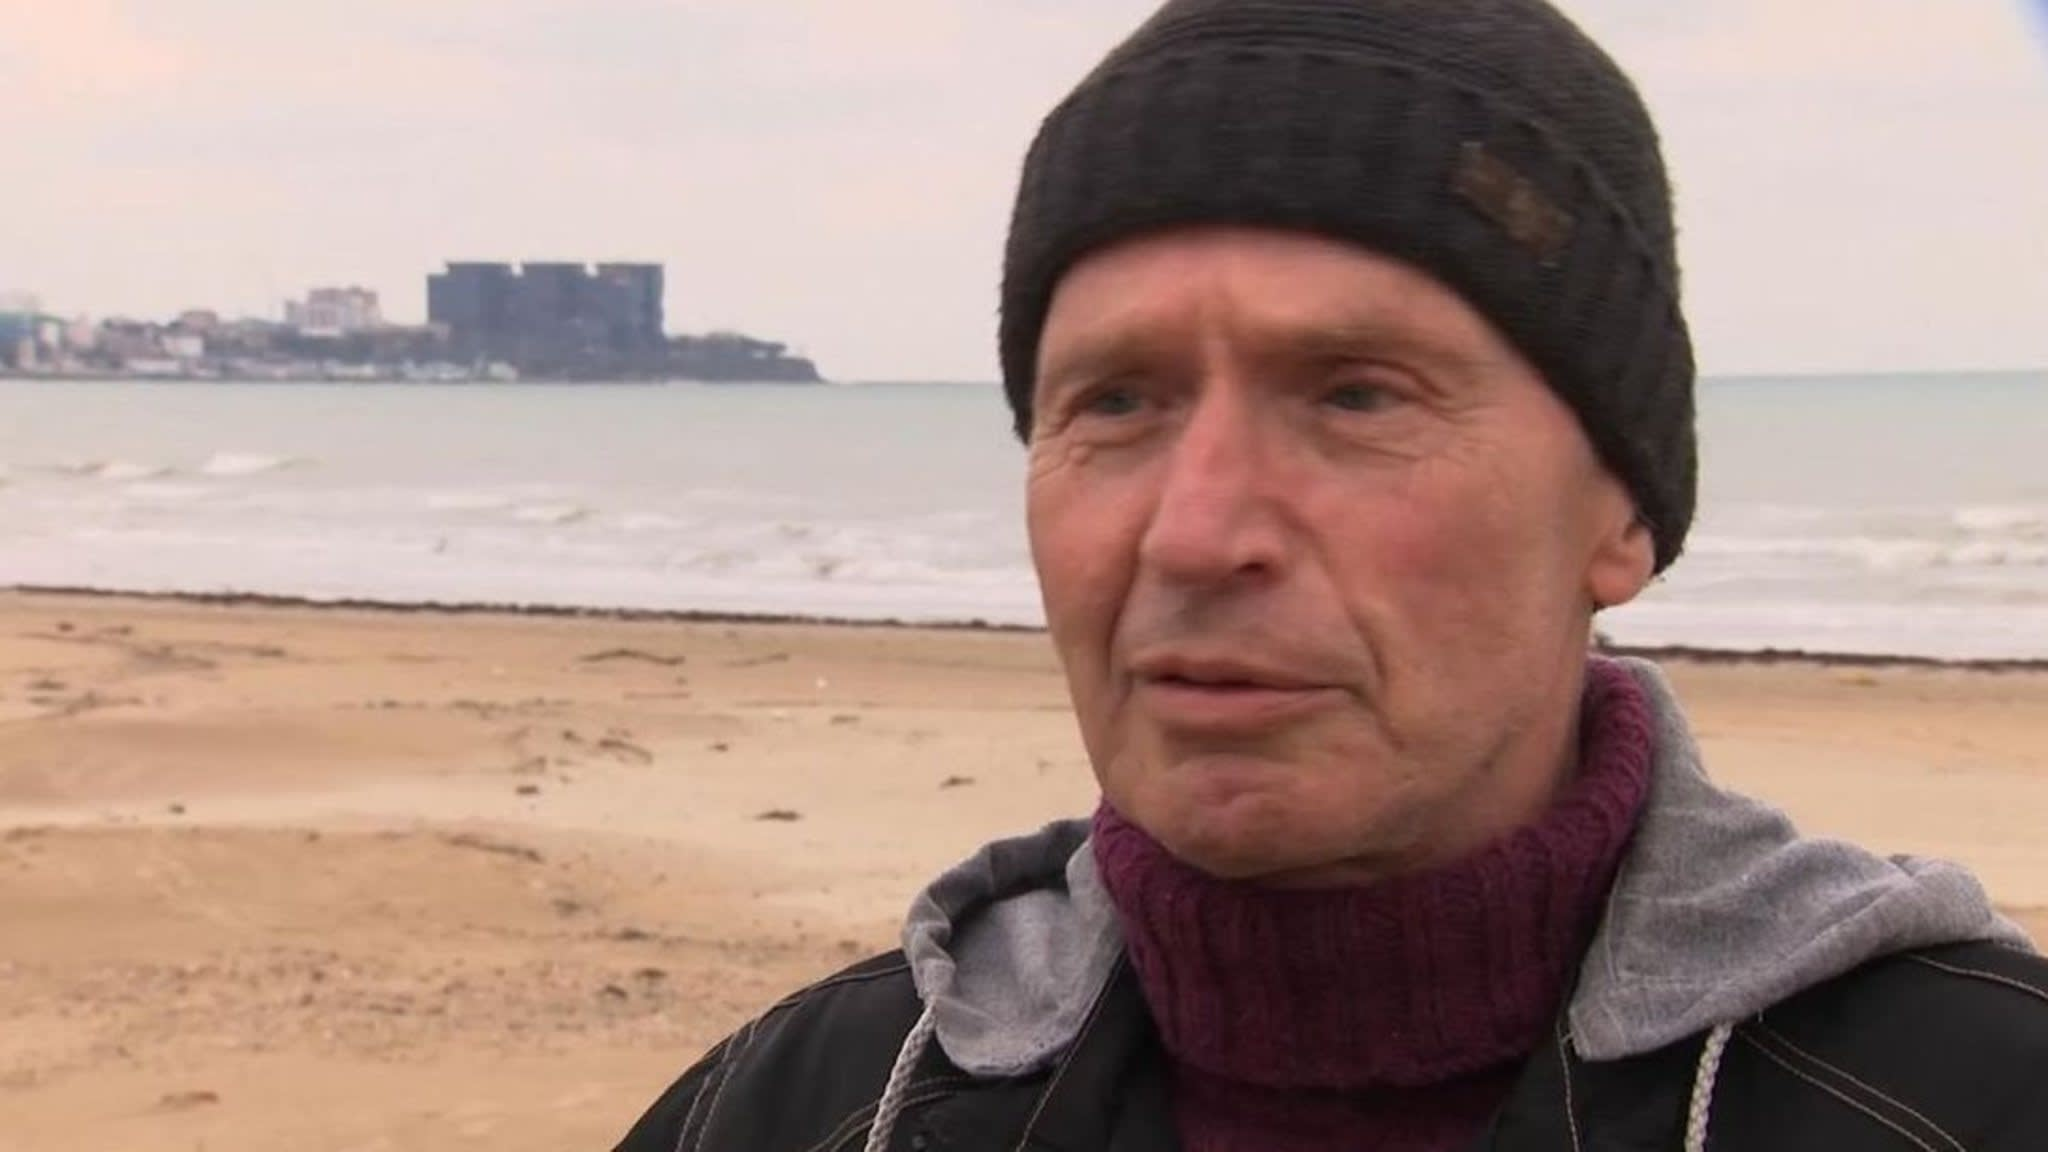 Soviet scientist backs UK over Skripal poisoning